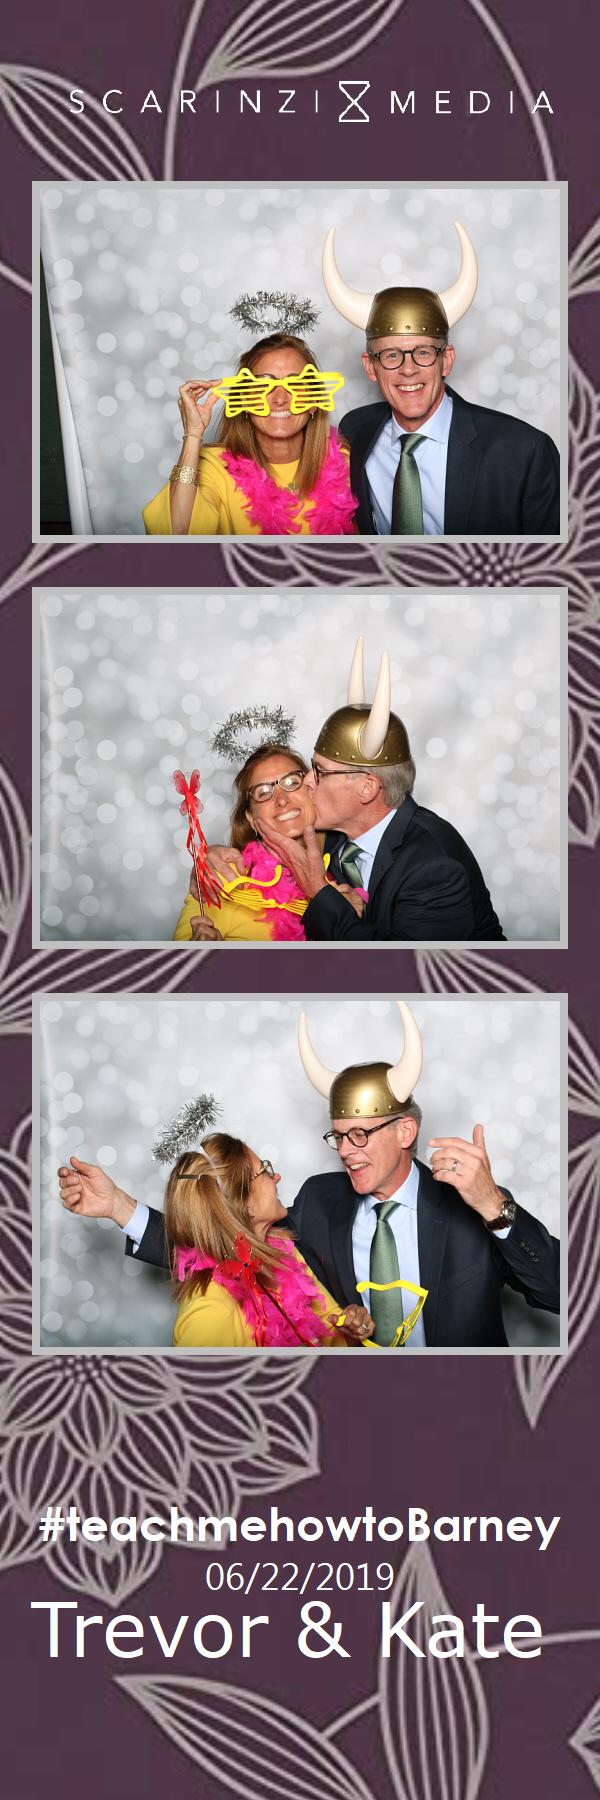 2019.06.22 - Barney Wedding PHOTOBOOTH22.jpg